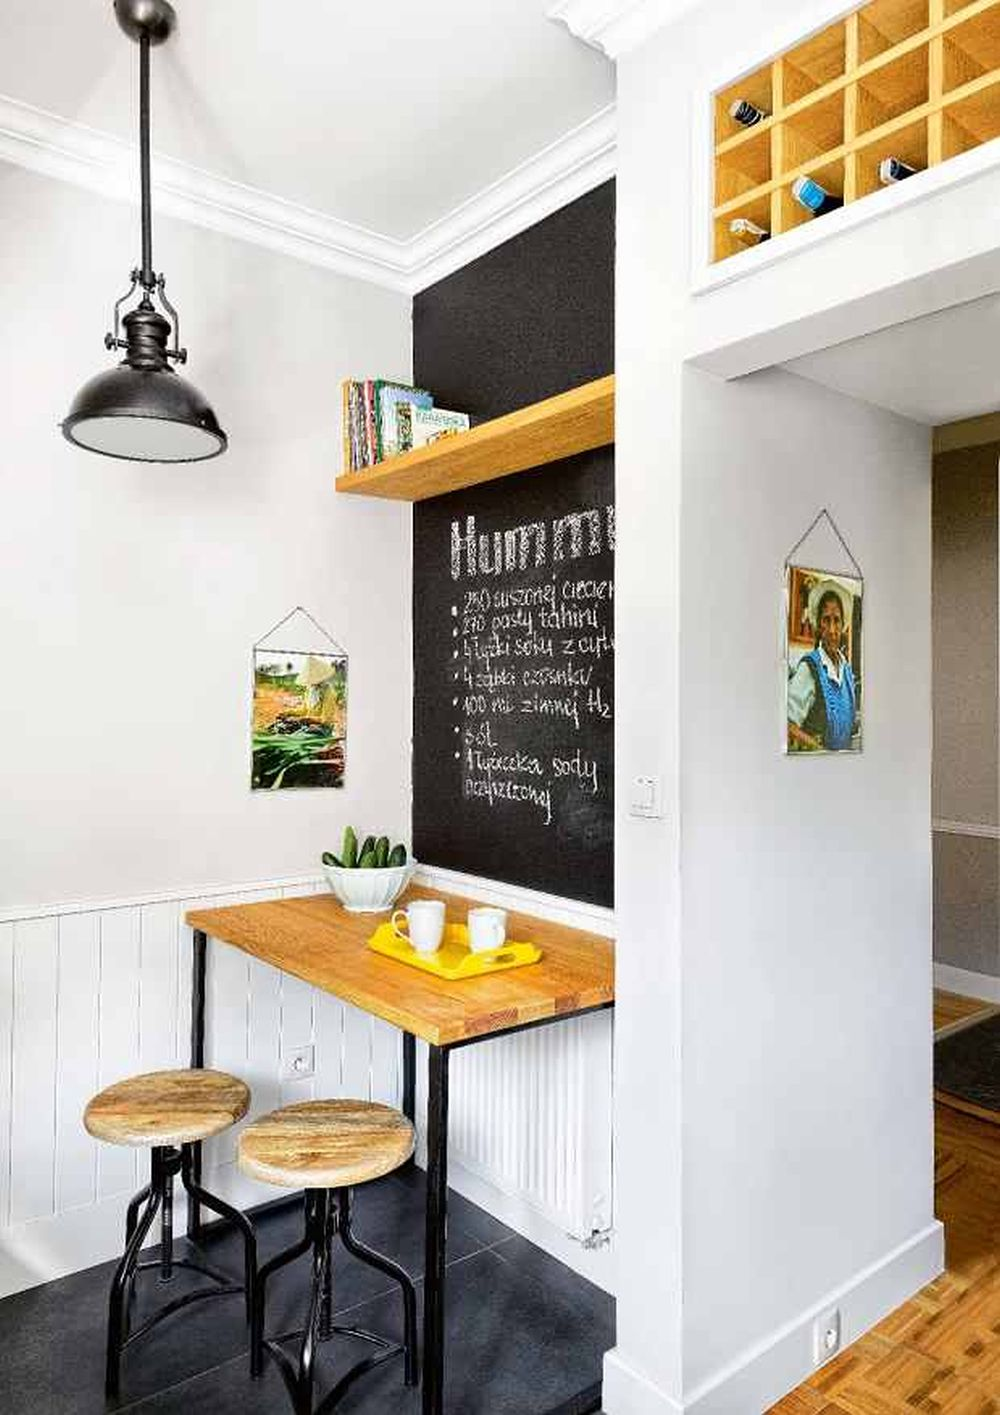 adelaparvu.com despre apartament cu accente de galben, designer Macieja Kocoja, Foto Mariusz Purta (10)